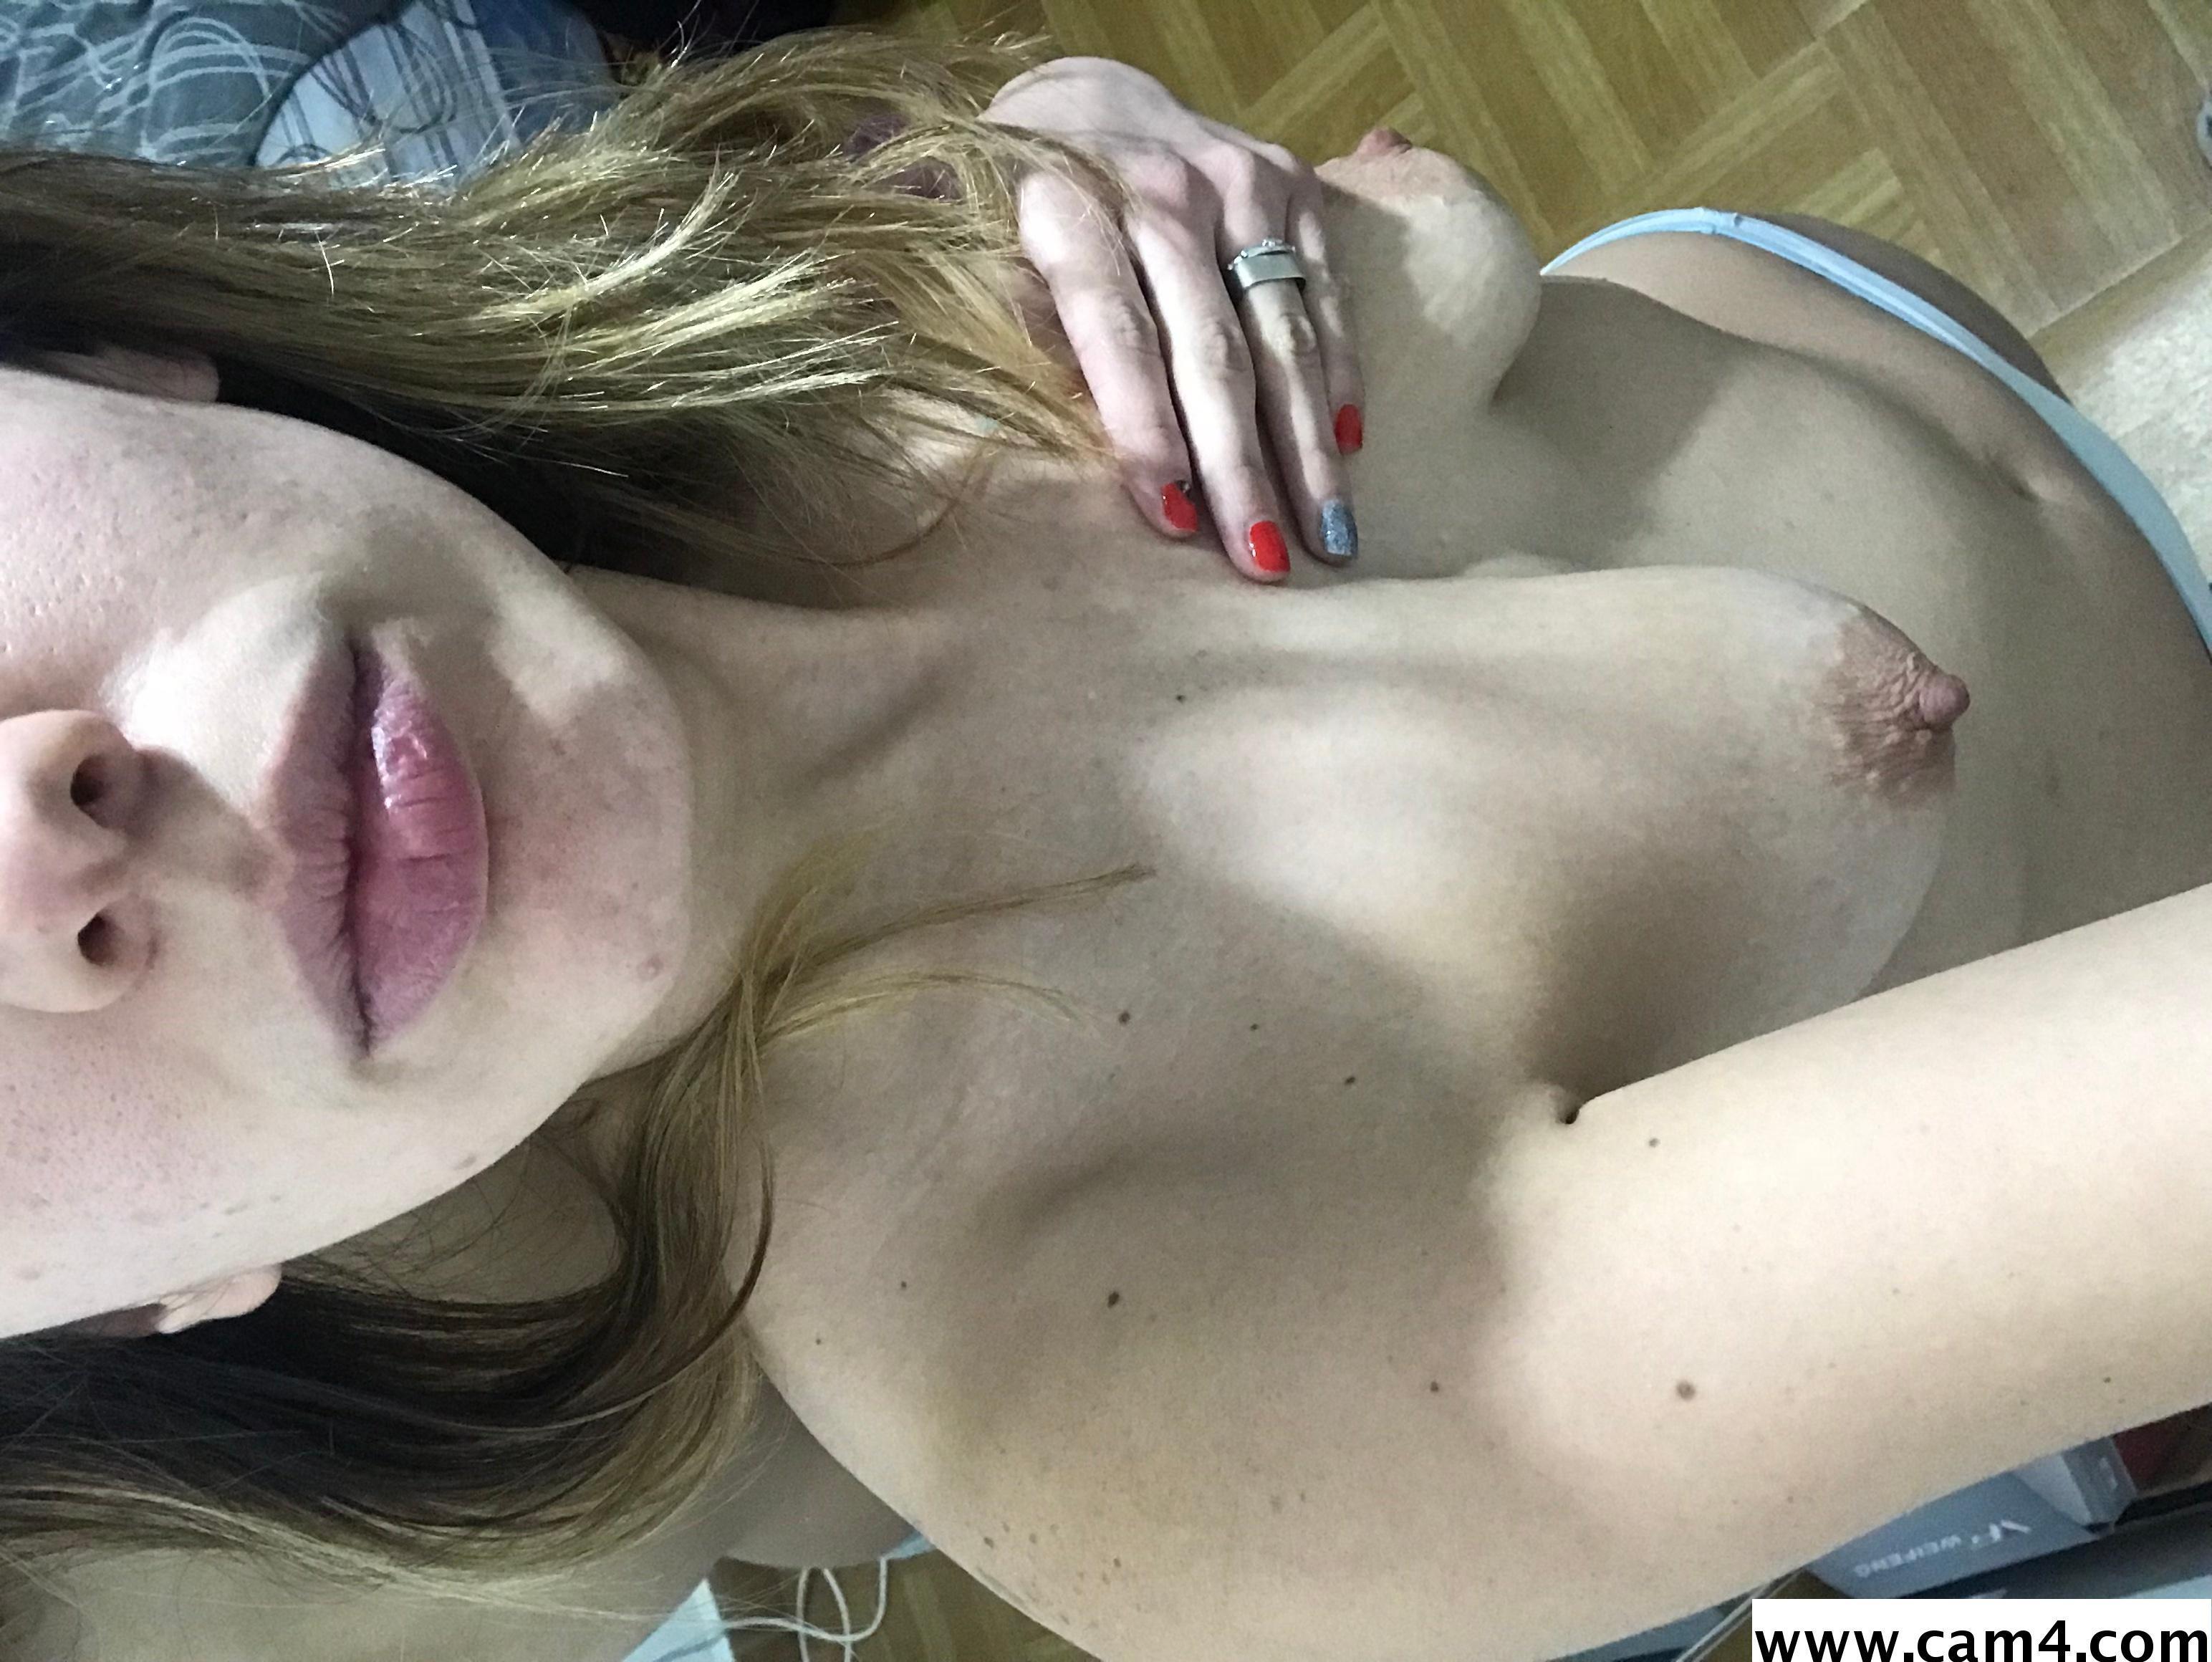 Big nipplels